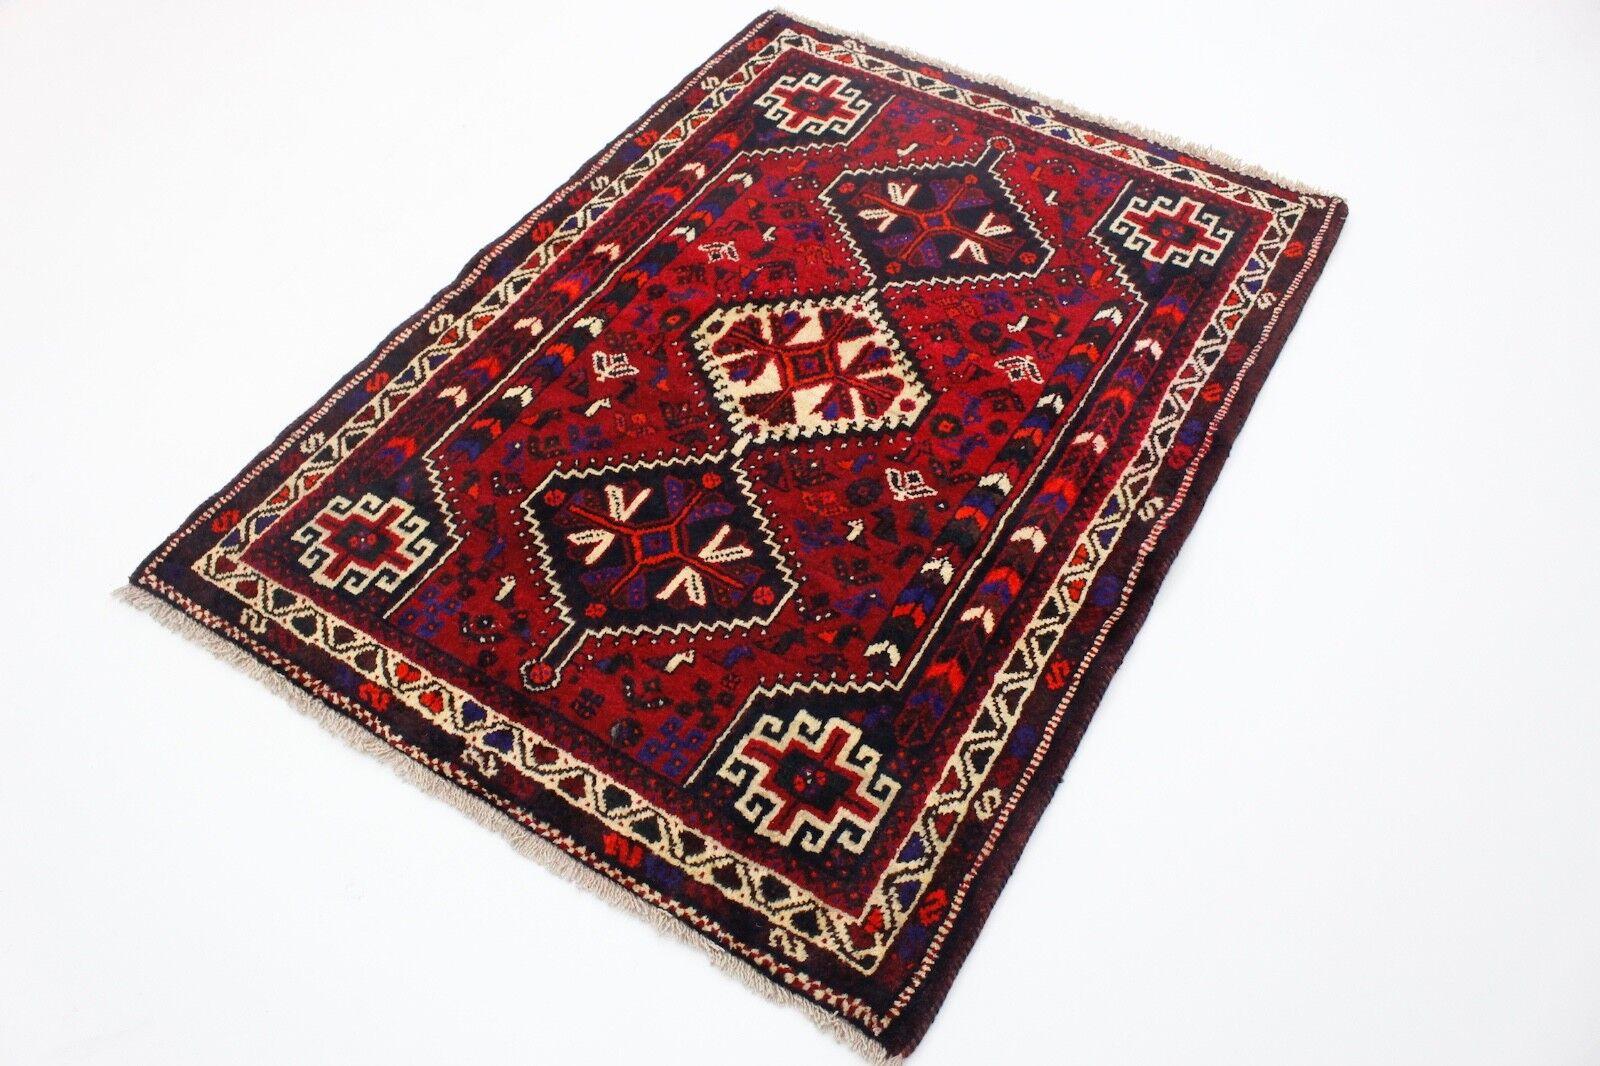 Tapis Tapis Tapis persan magazzino vendita bel Shiraz 170x120 mano intessuti pulito KL 4294 e89574